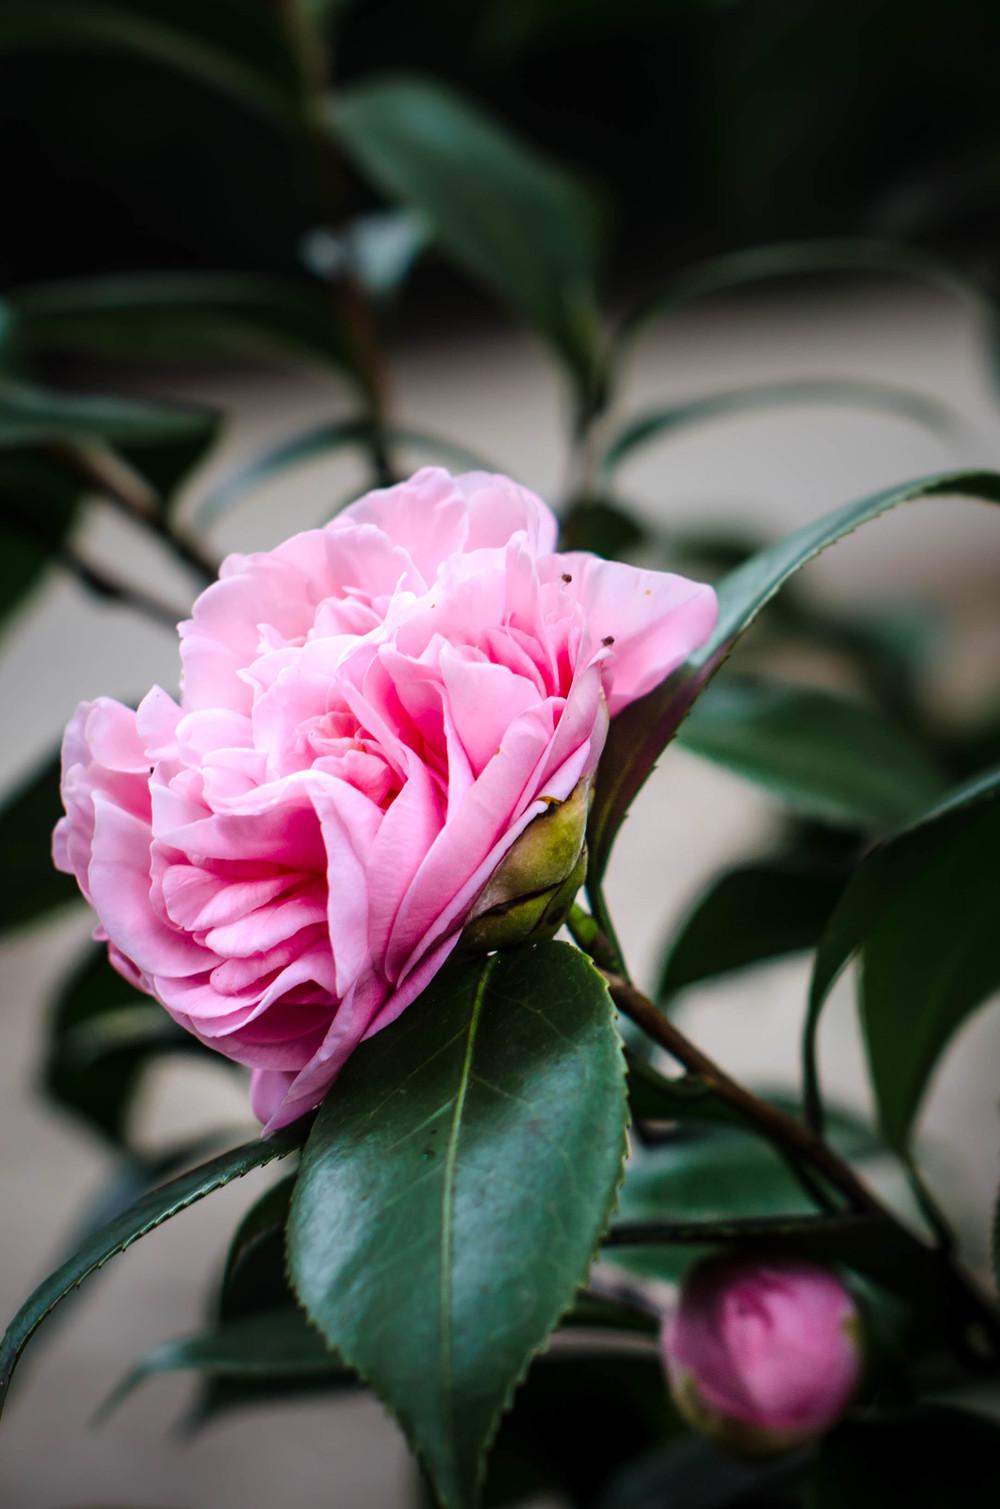 ROSE & IVY Journal Petal by Petal Camellia